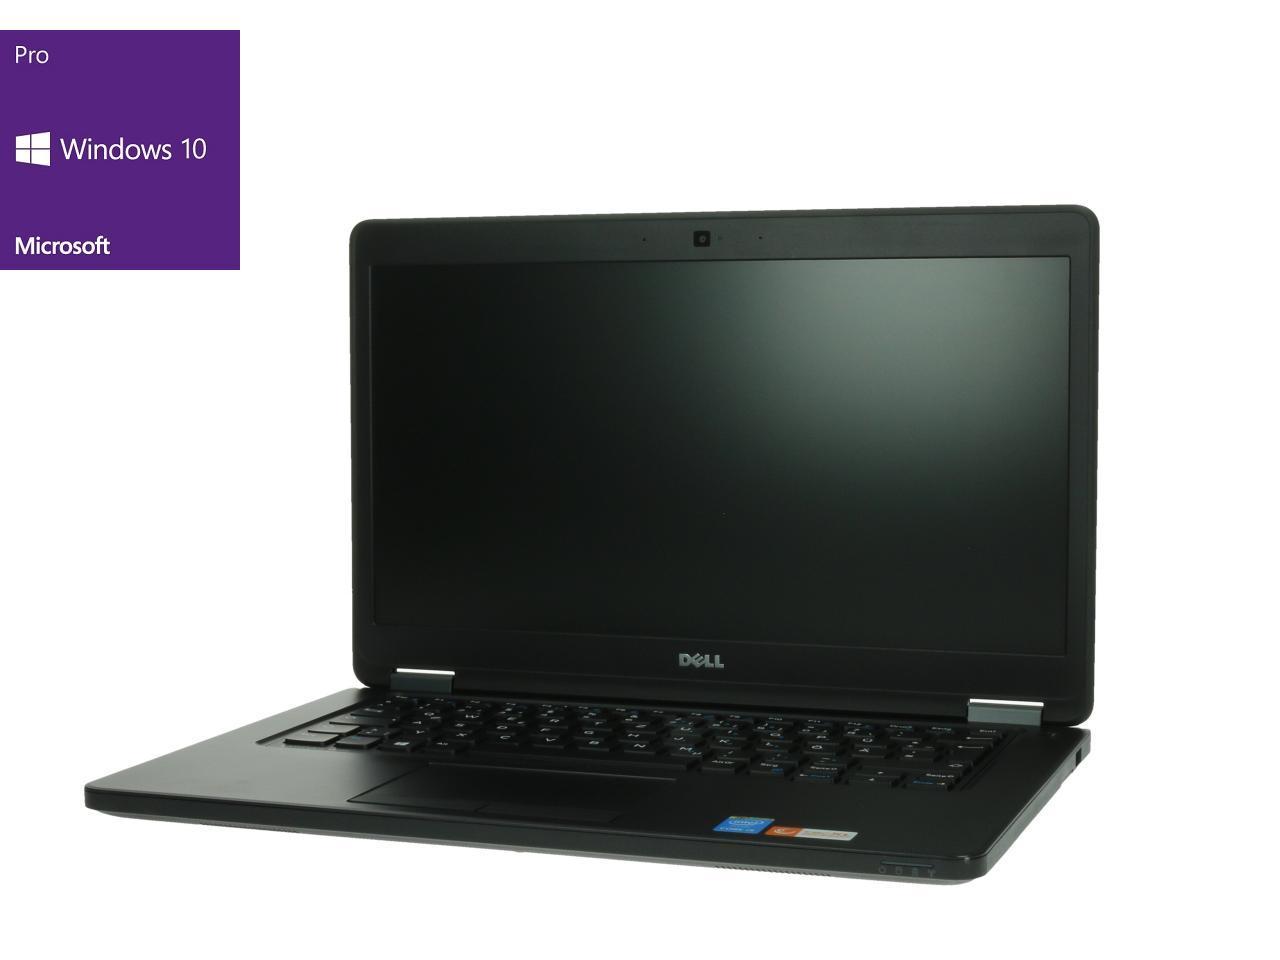 Dell Latitude E5450  - shop.bb-net.de